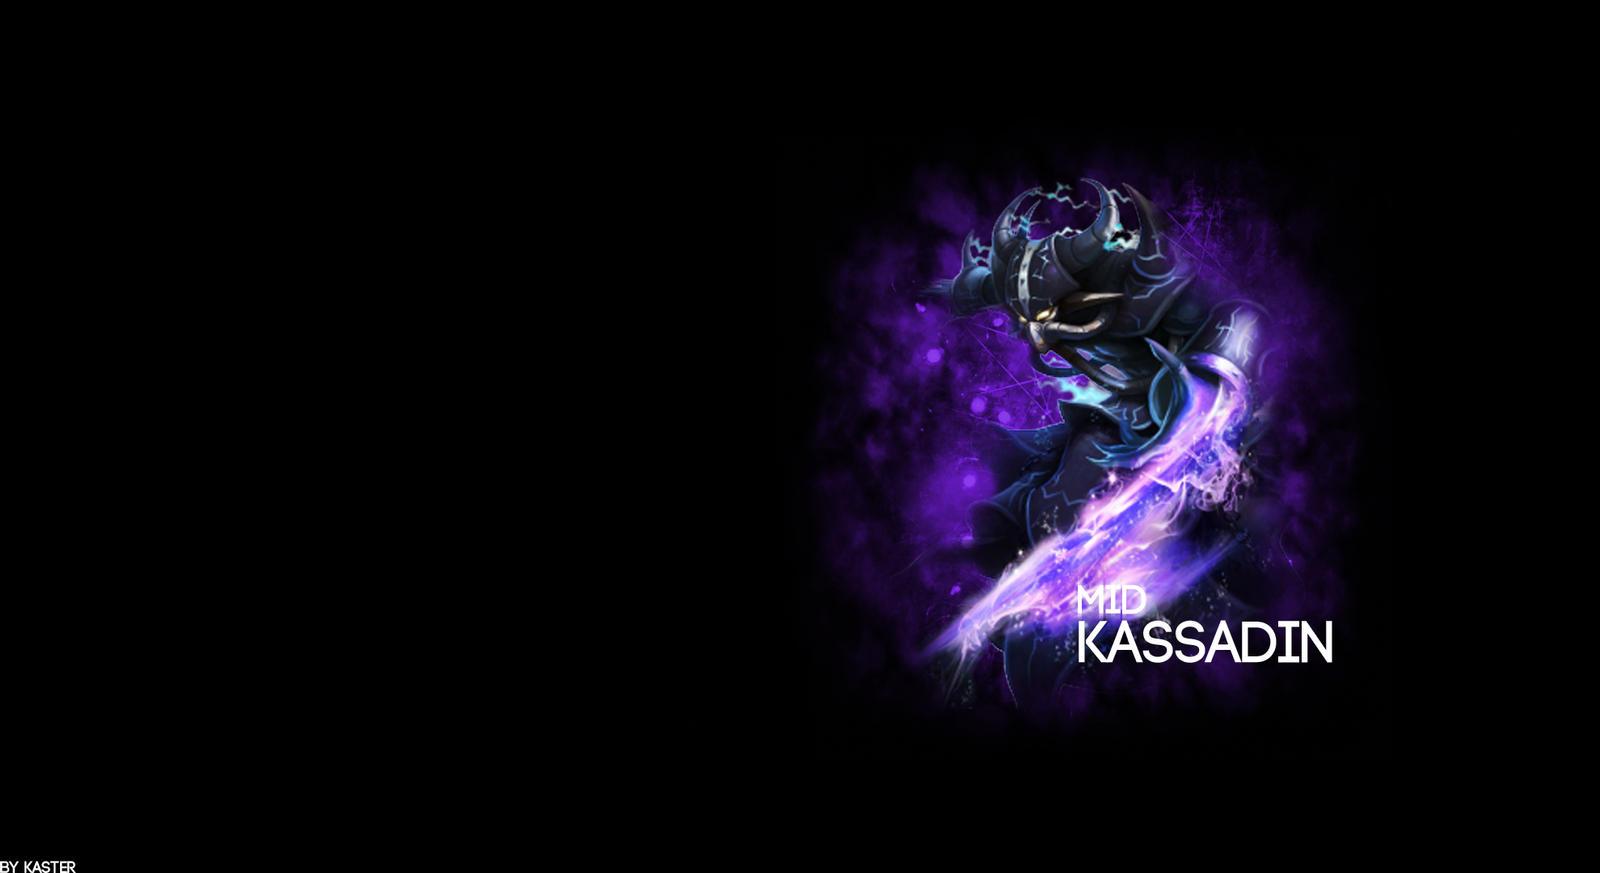 League Of Legends: Mid Kassadin by Kaster533 on DeviantArt